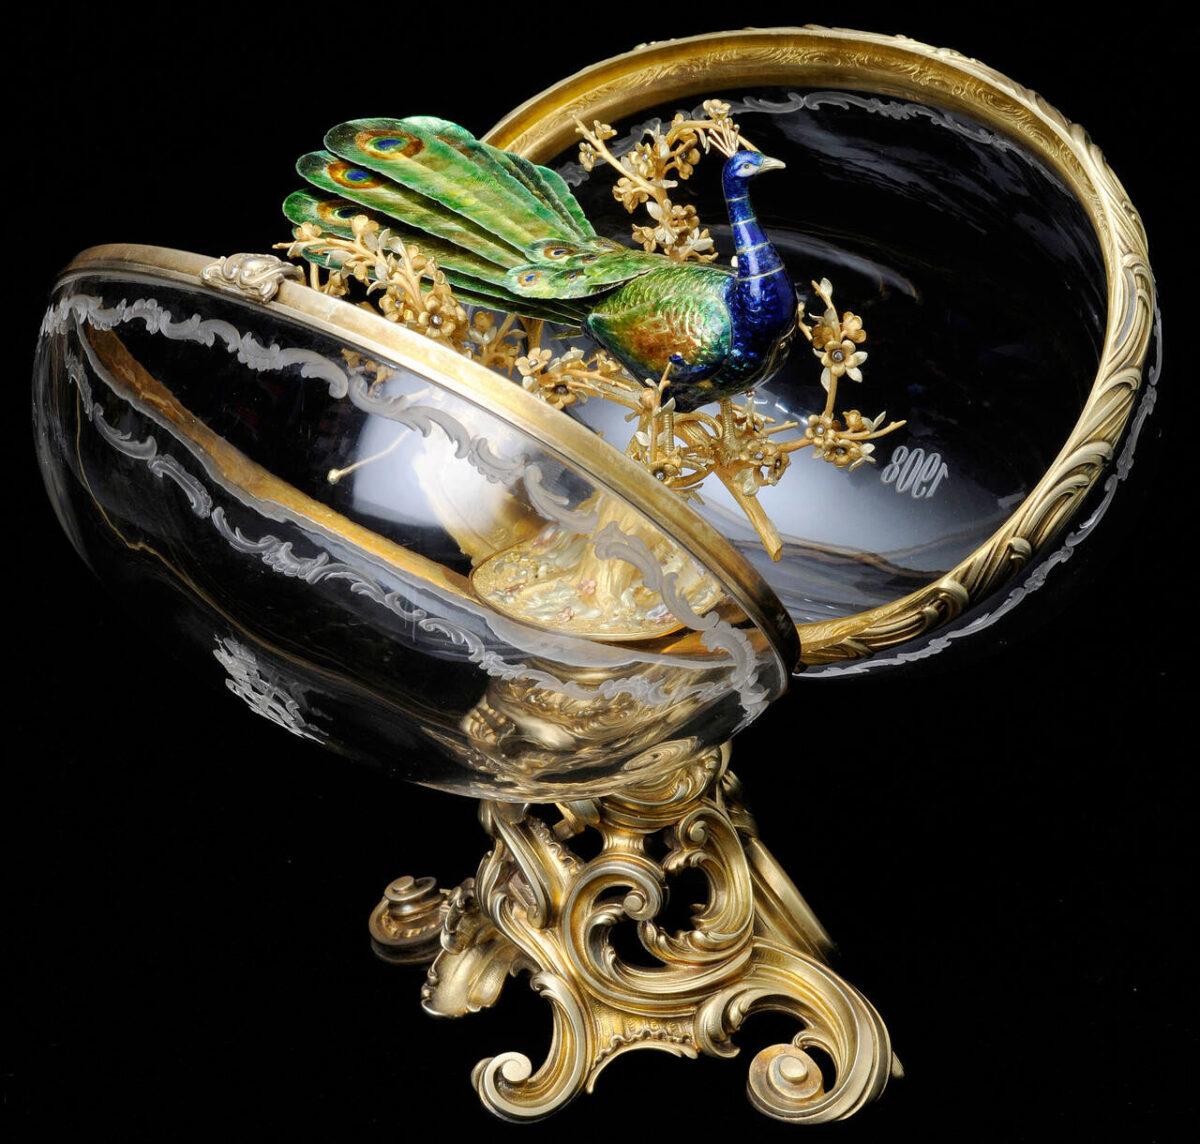 «The Peacock Egg», το κρυστάλλινο αυγό που κρύβει μέσα ένα επισμαλτωμένο χρυσό παγώνι με μηχανισμό (πηγή εικόνας: V&A Museum).